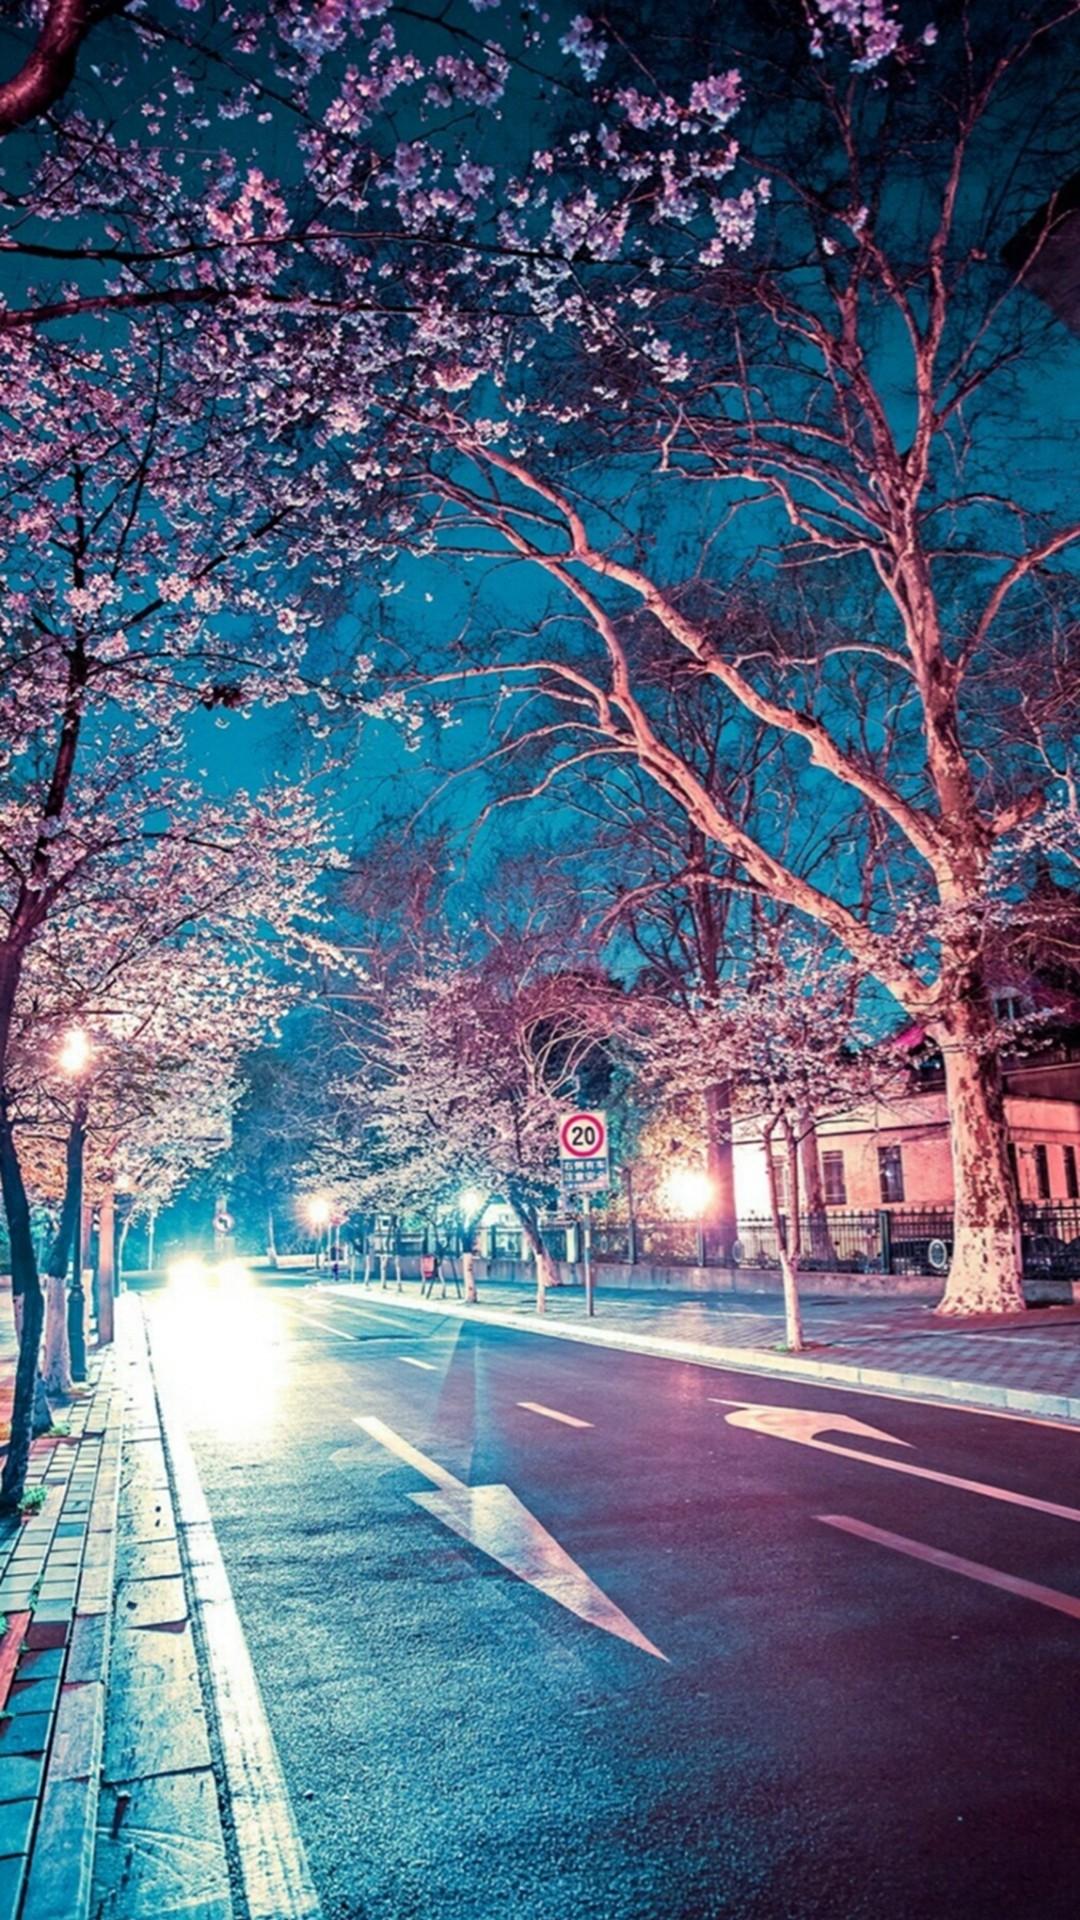 Japanese Street Cherry Blossom Night Scenery iPhone 8 wallpaper